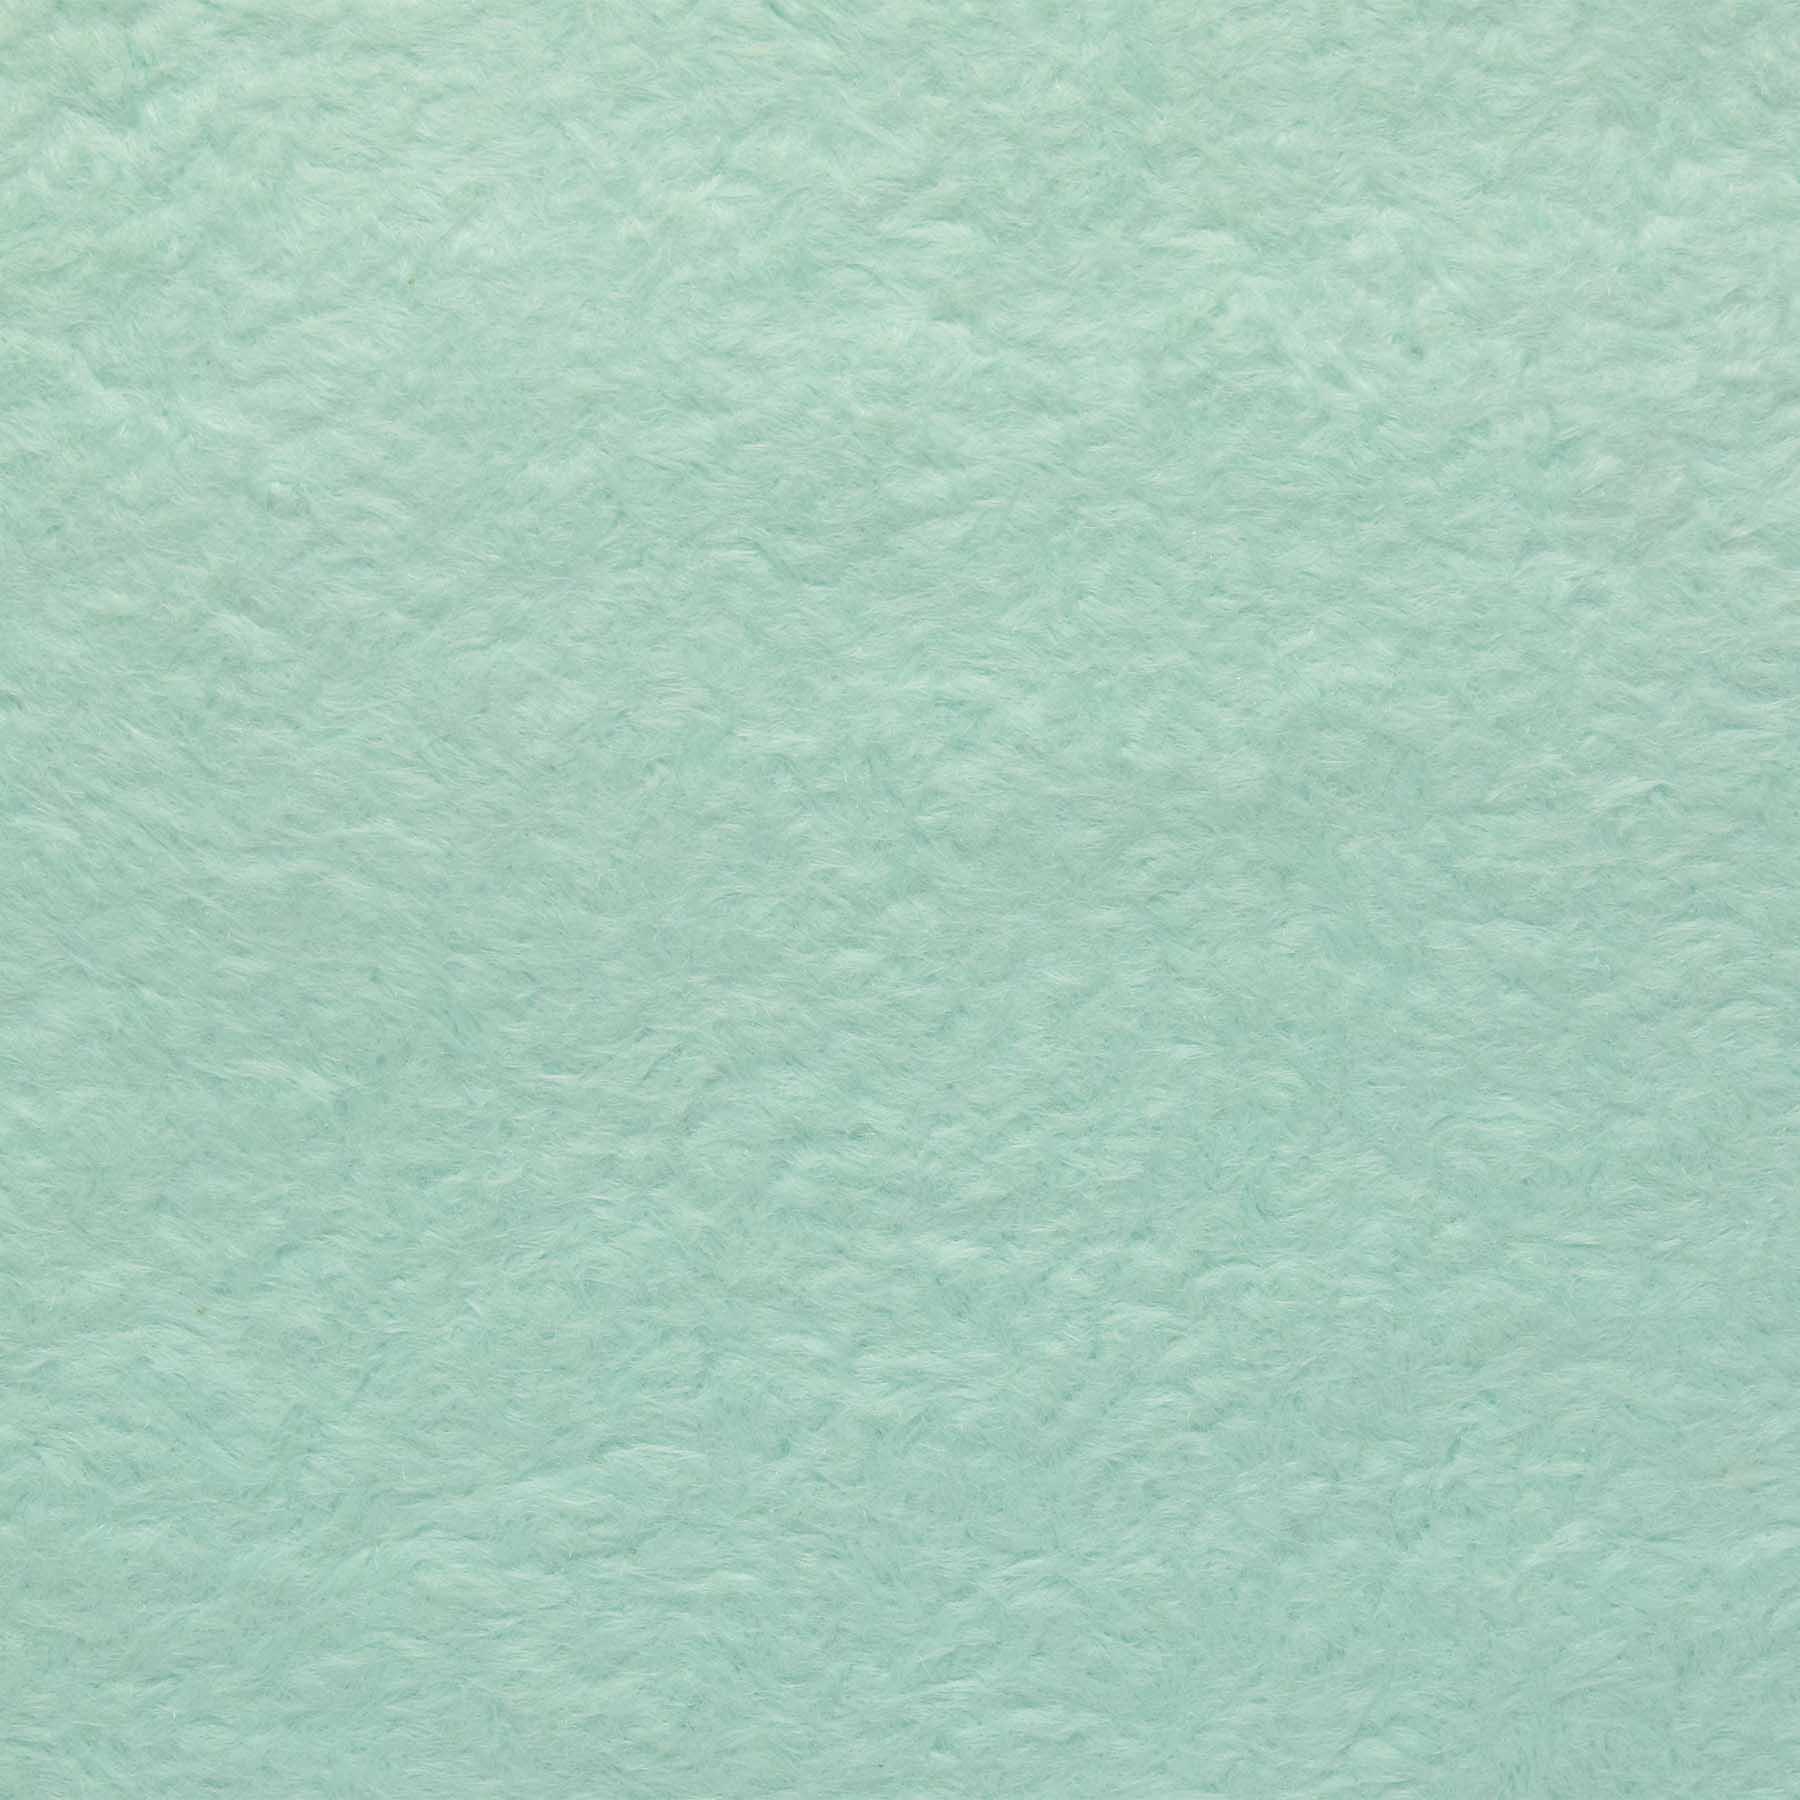 Жидкие обои Silk plaster Арт дизайн 301